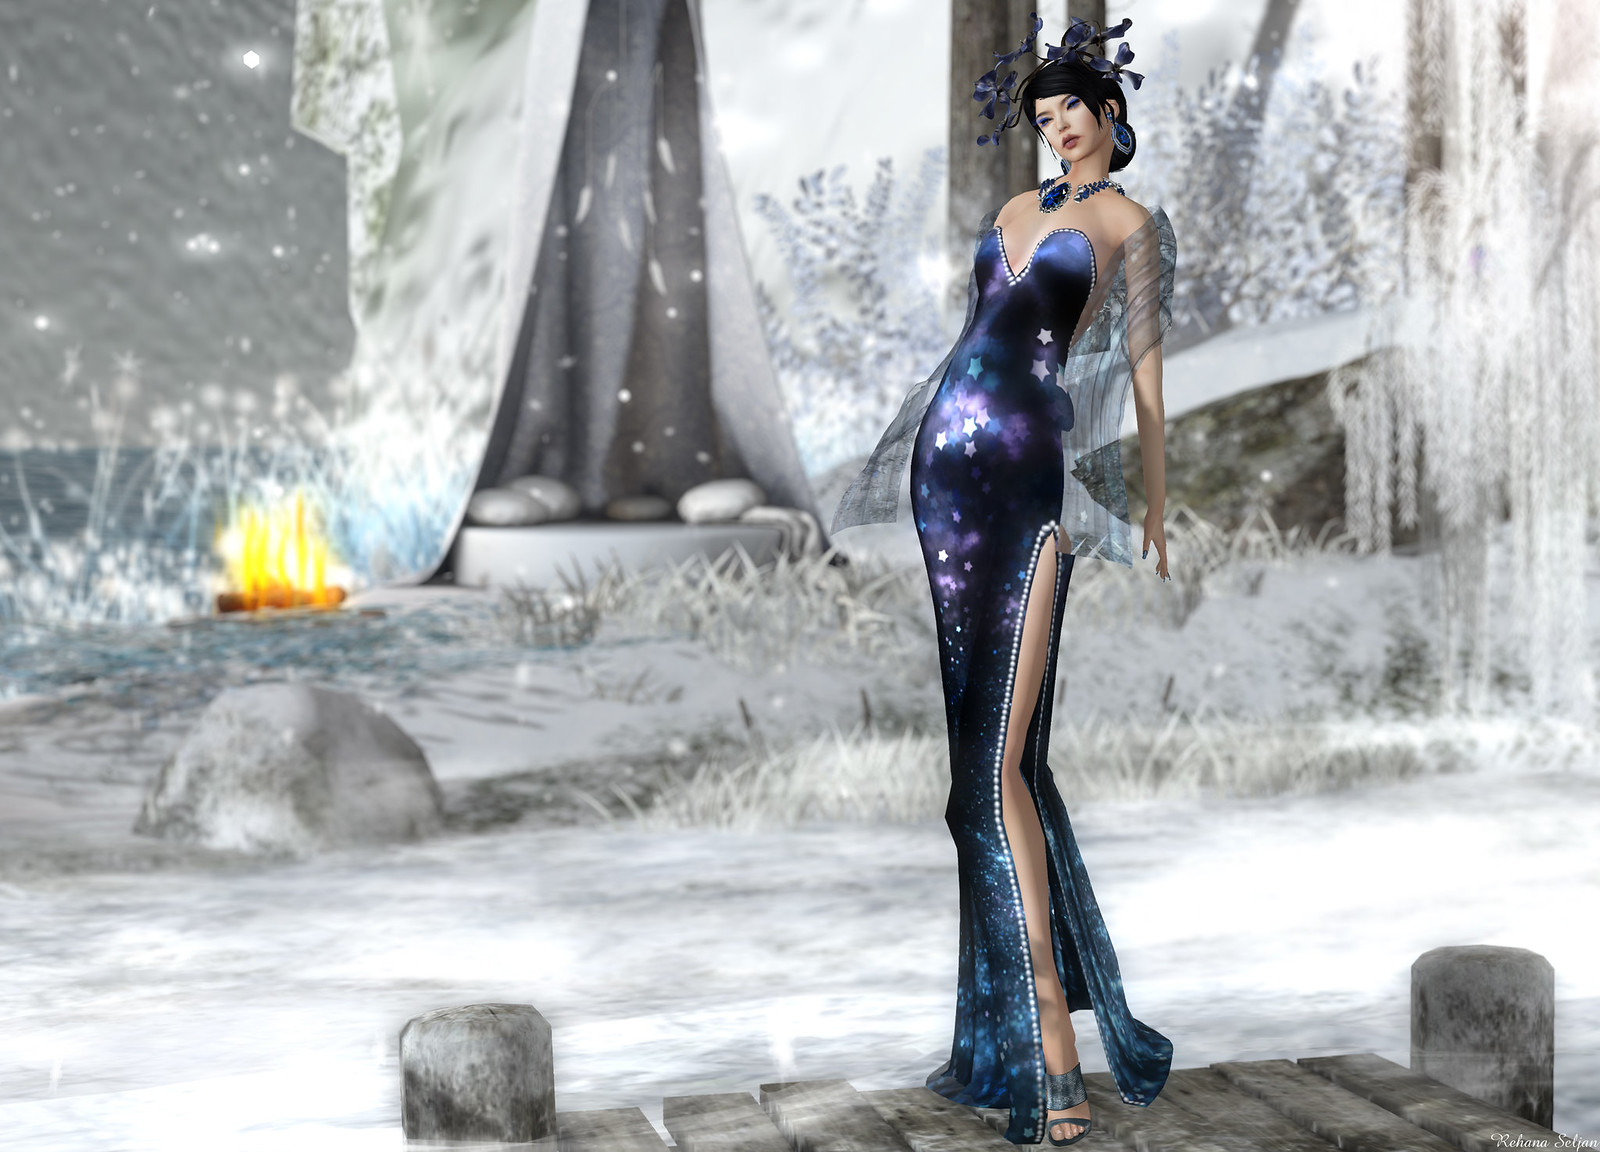 Styles of Danielle - Seren (Dec Group Gift)